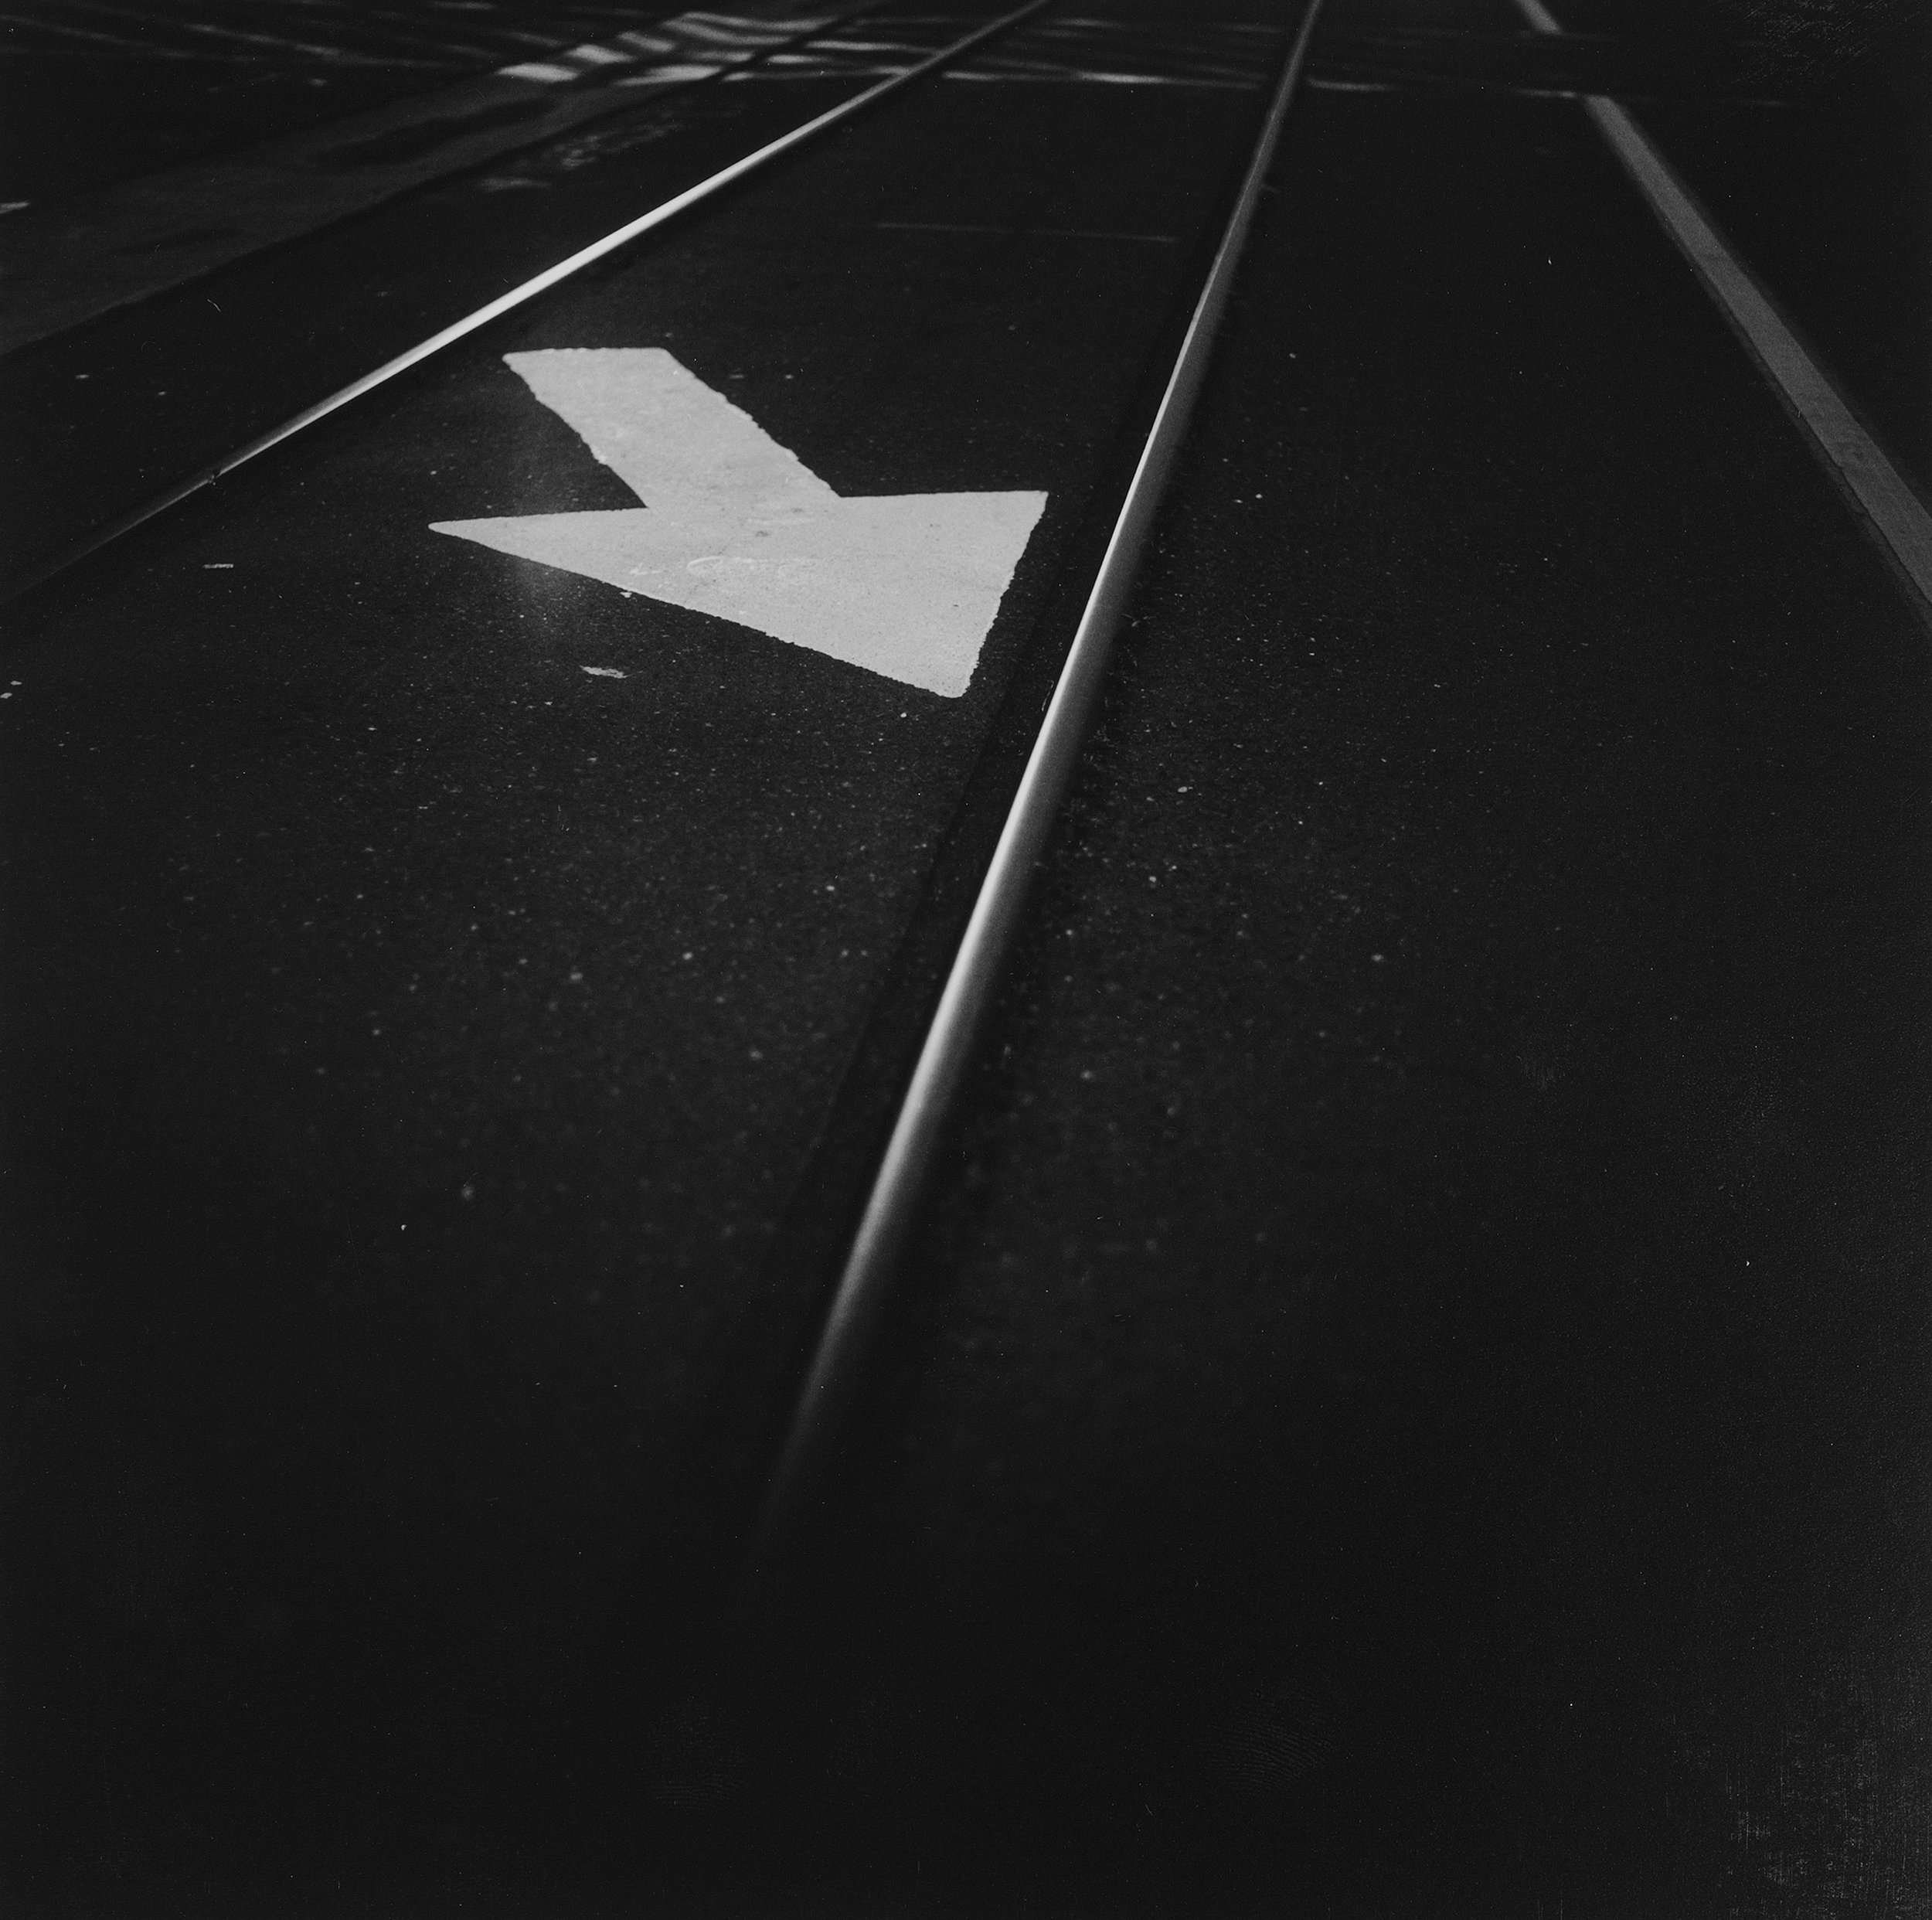 Arrow, Train Tracks, Mare Island